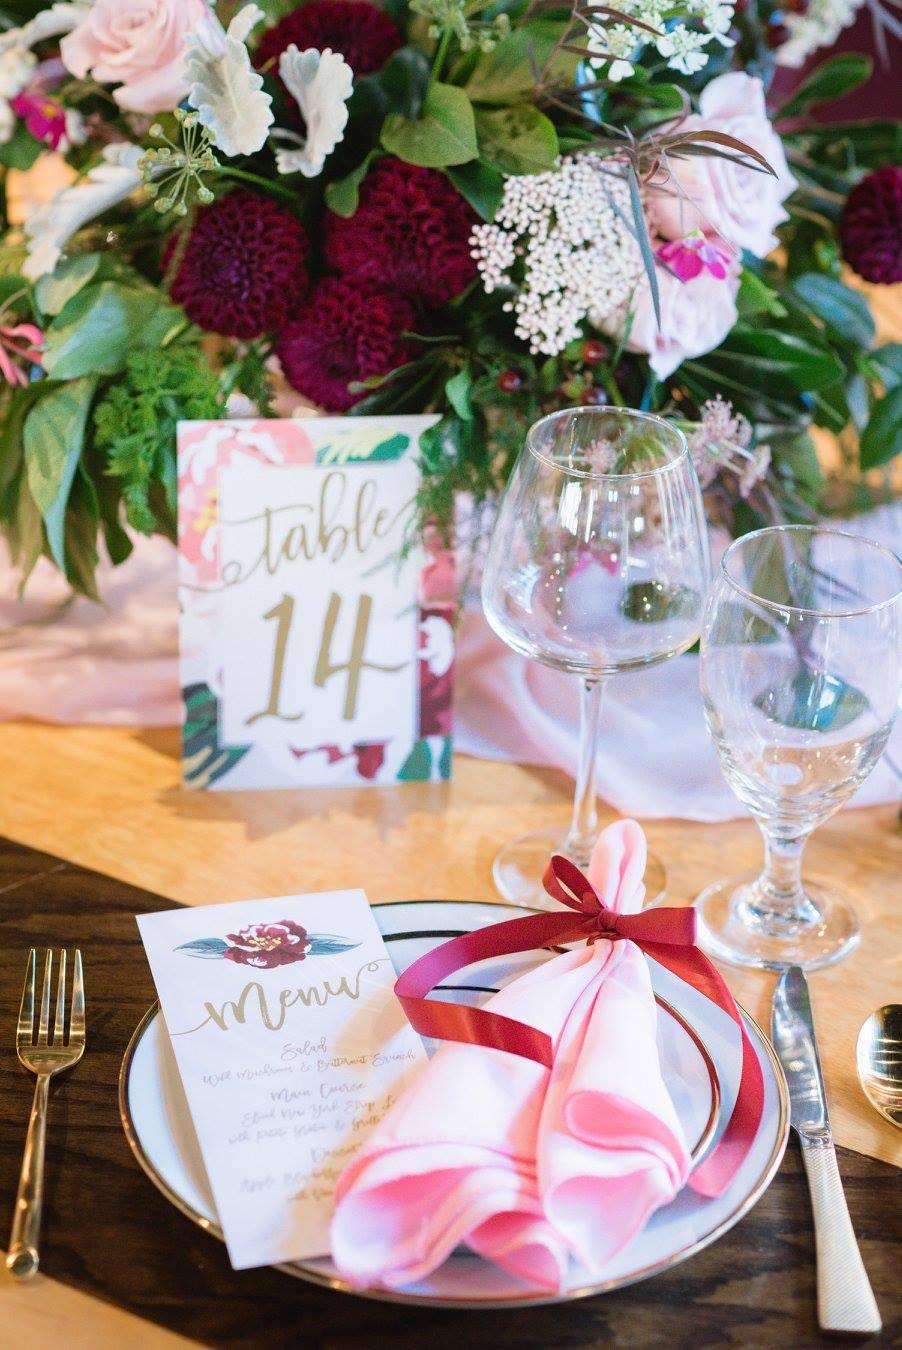 A Blush & Burgundy Wine Bar Soiree by Event Prep